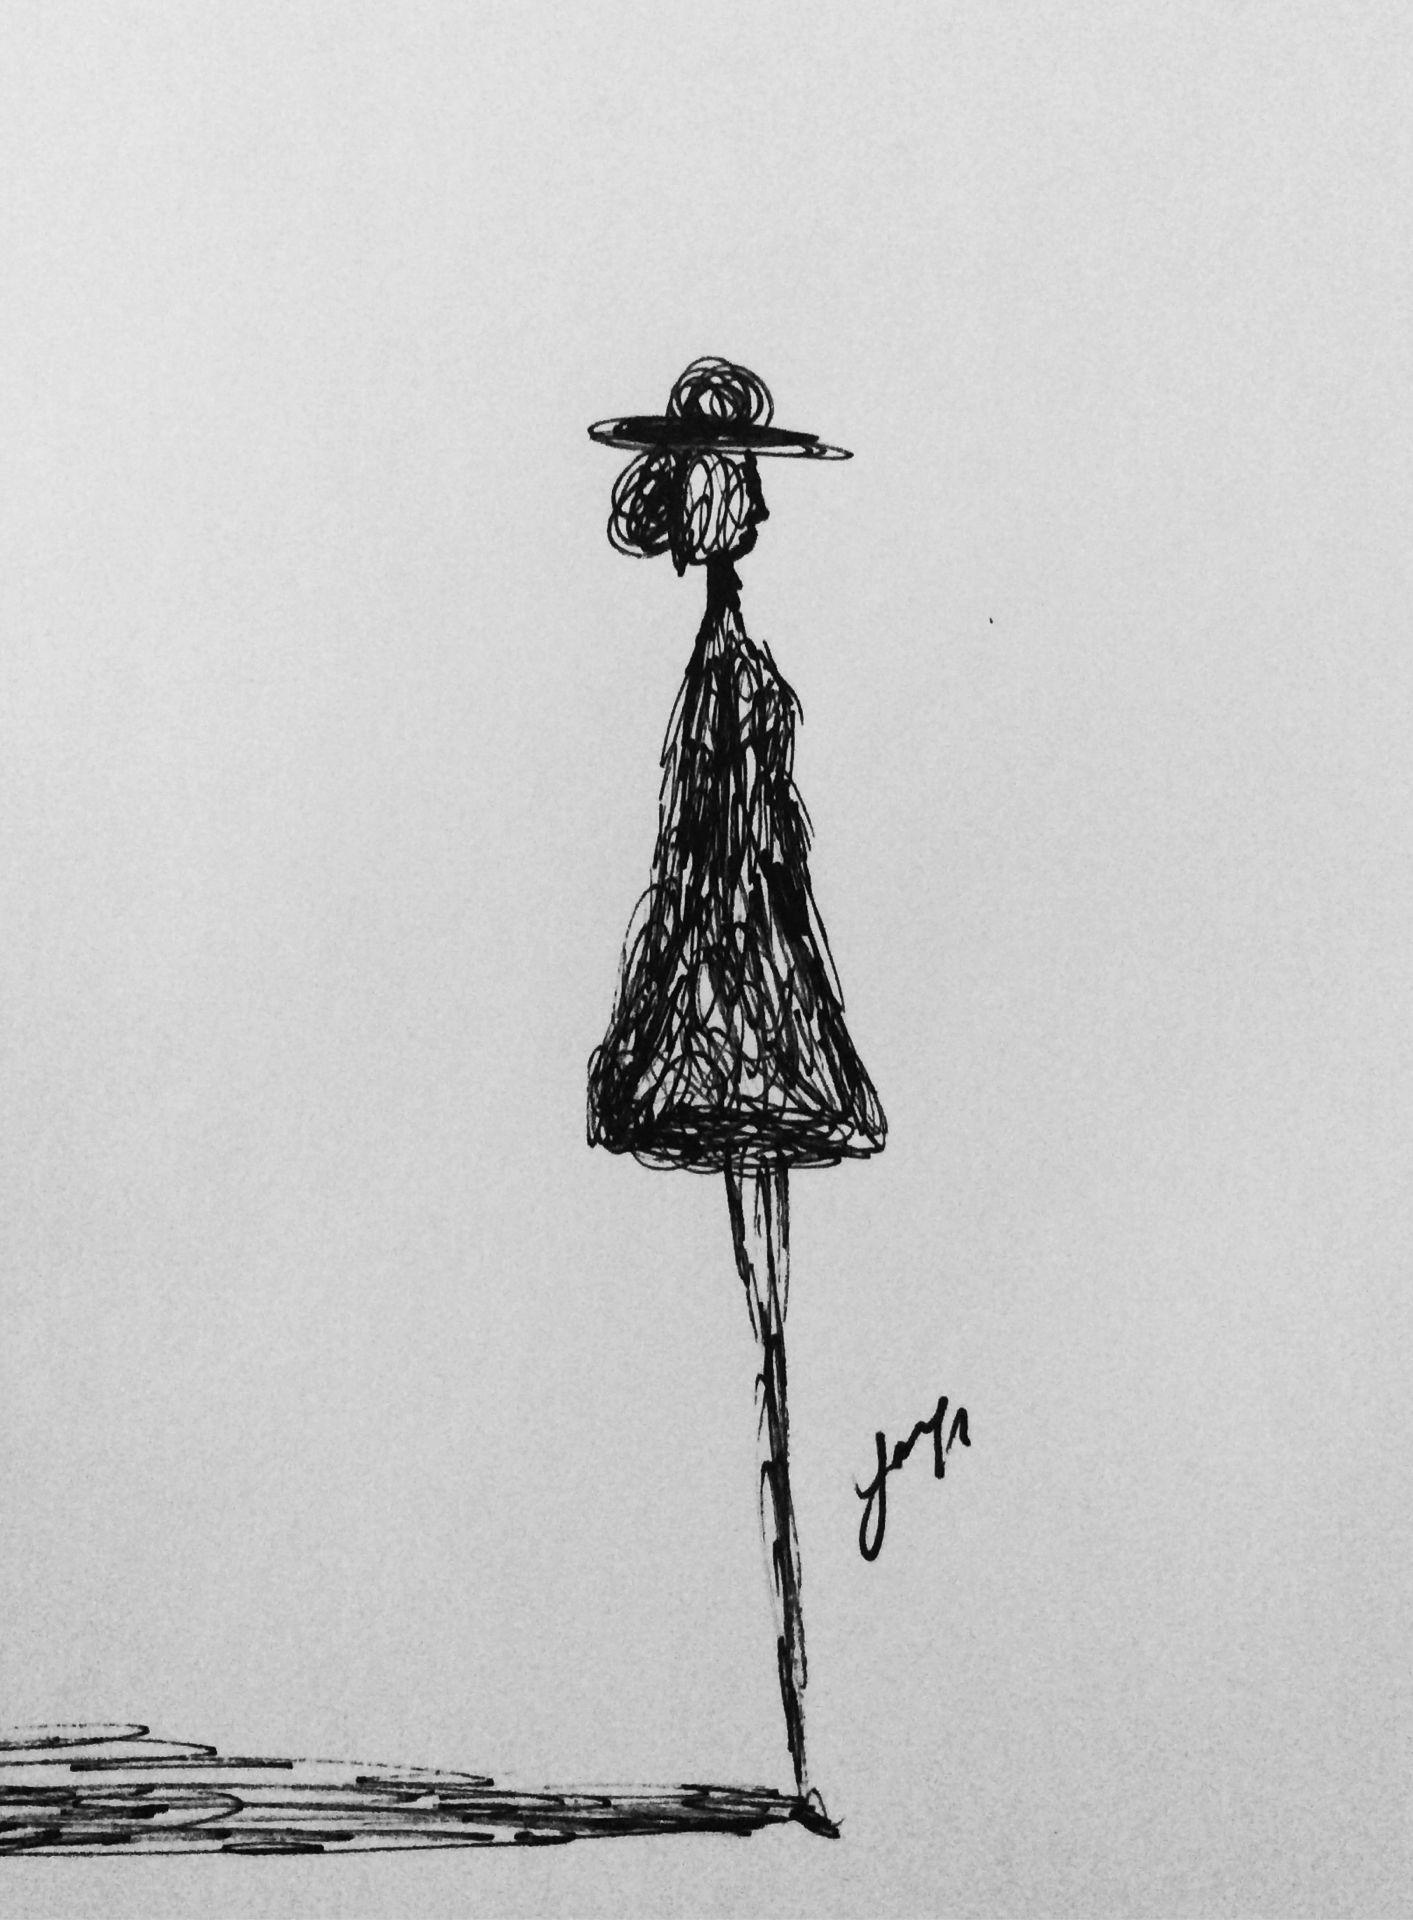 Minimal Illustration / Minimal / Art / Creative / Draw / Design / Resim /  Çizim